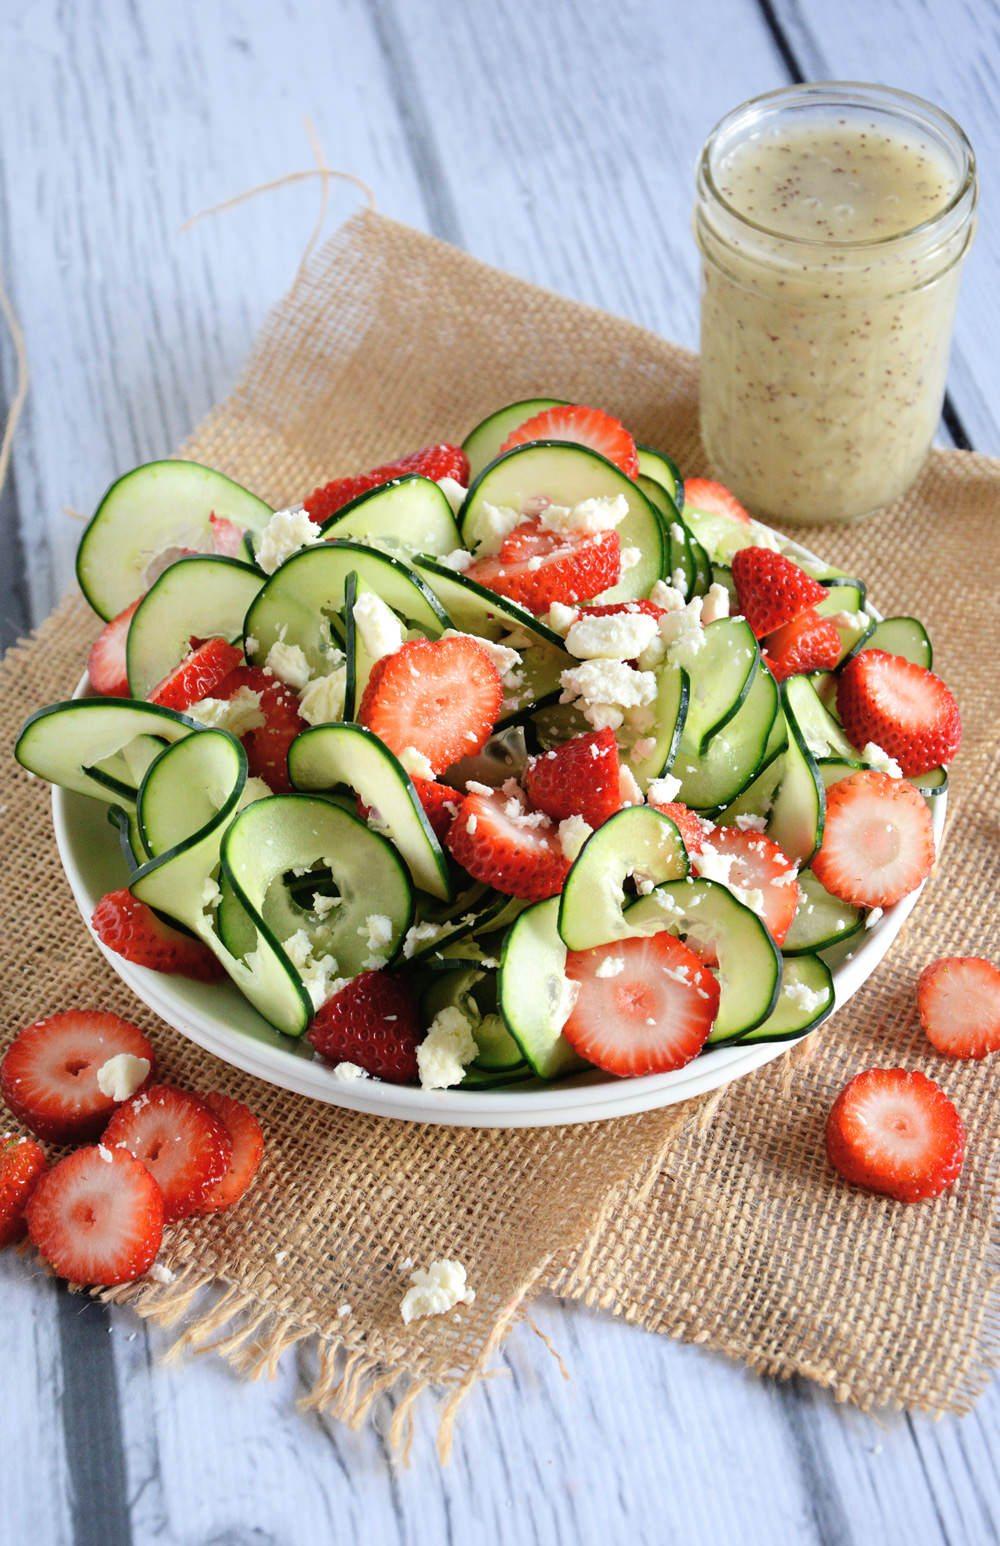 KitchenAid Spiralizer | Cucumber & Strawberry Poppyseed Salad